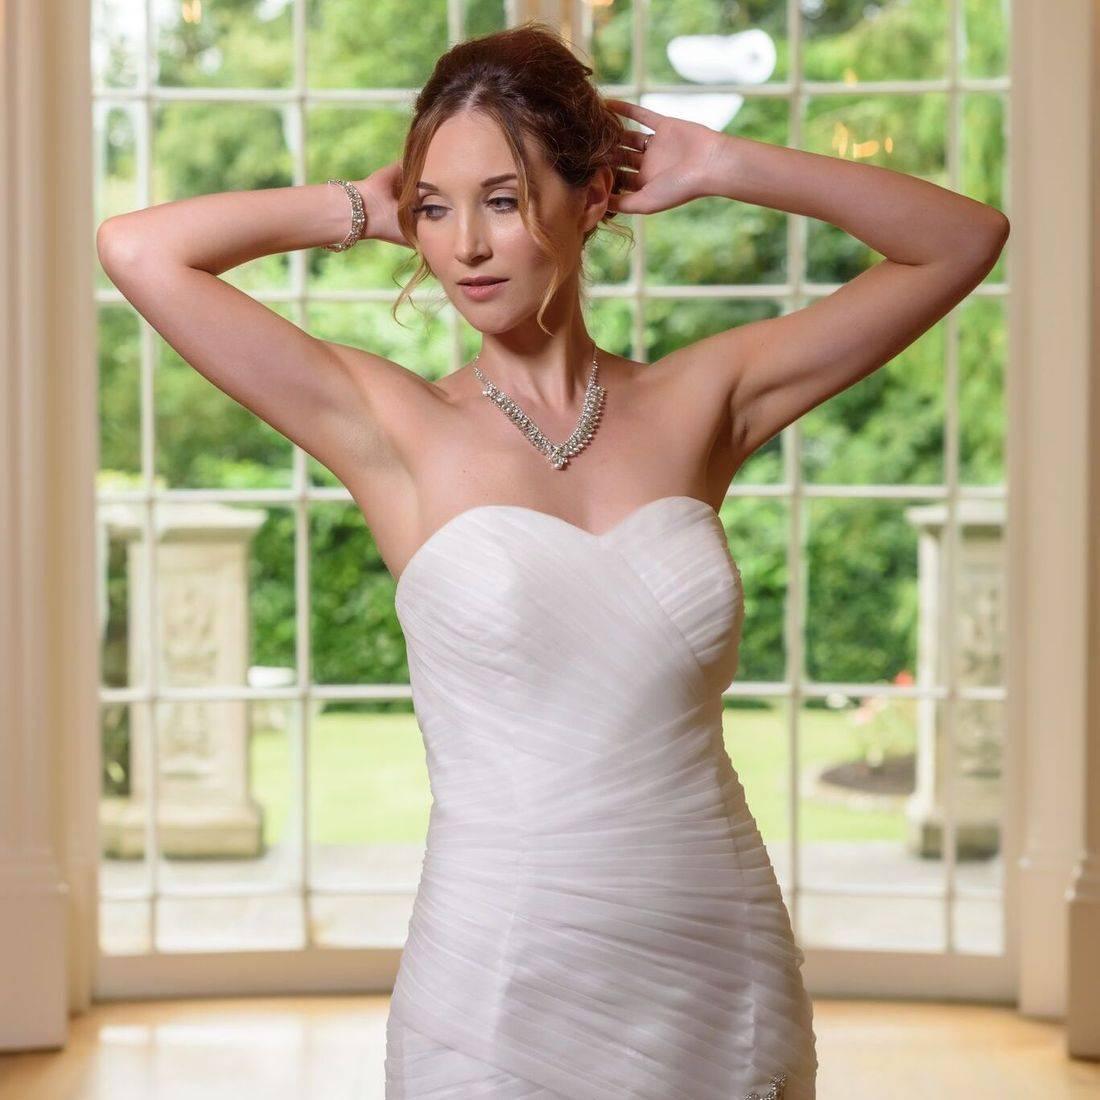 ruched bodice wedding dress, plain wedding dress, wedding dresses with sweetheart neckline, organza wedding dresses, simple wedding dresses